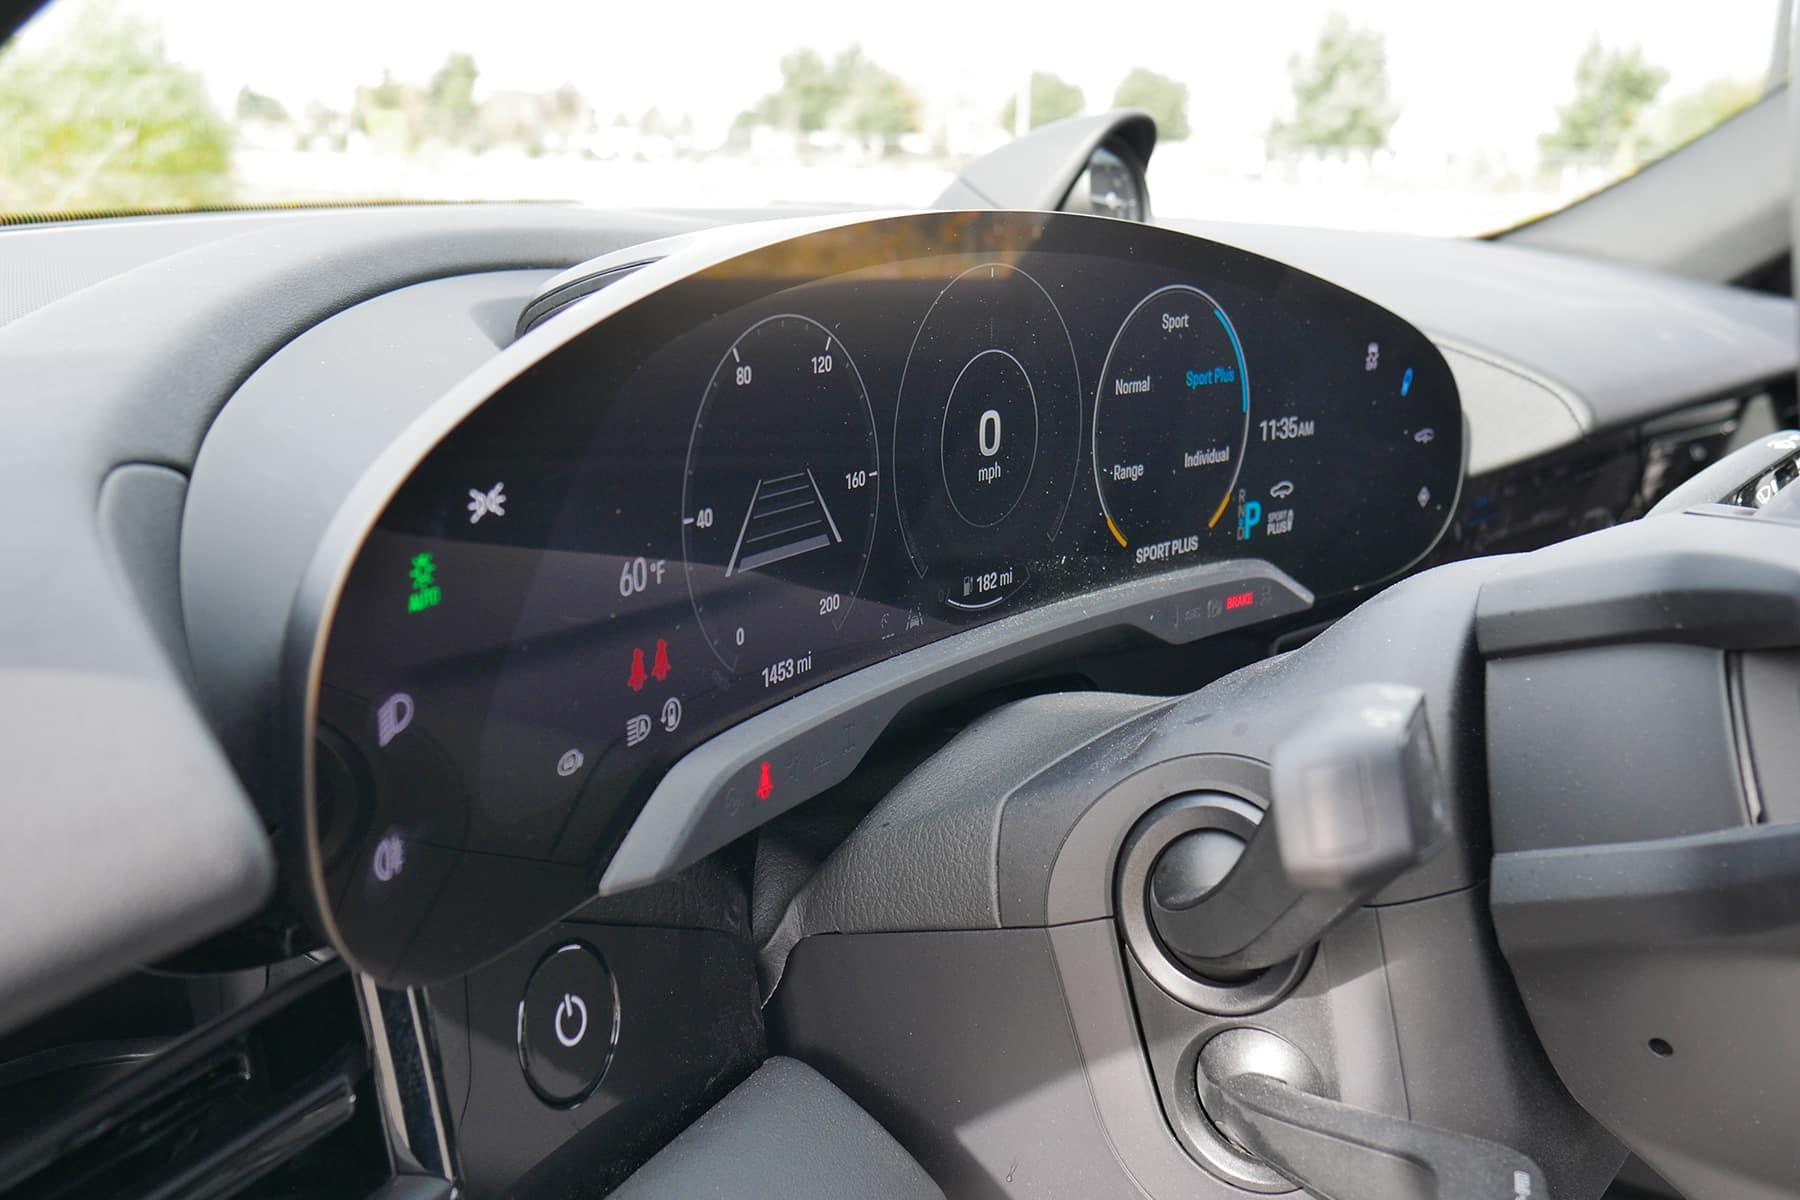 Porsche Taycan Curved Screen